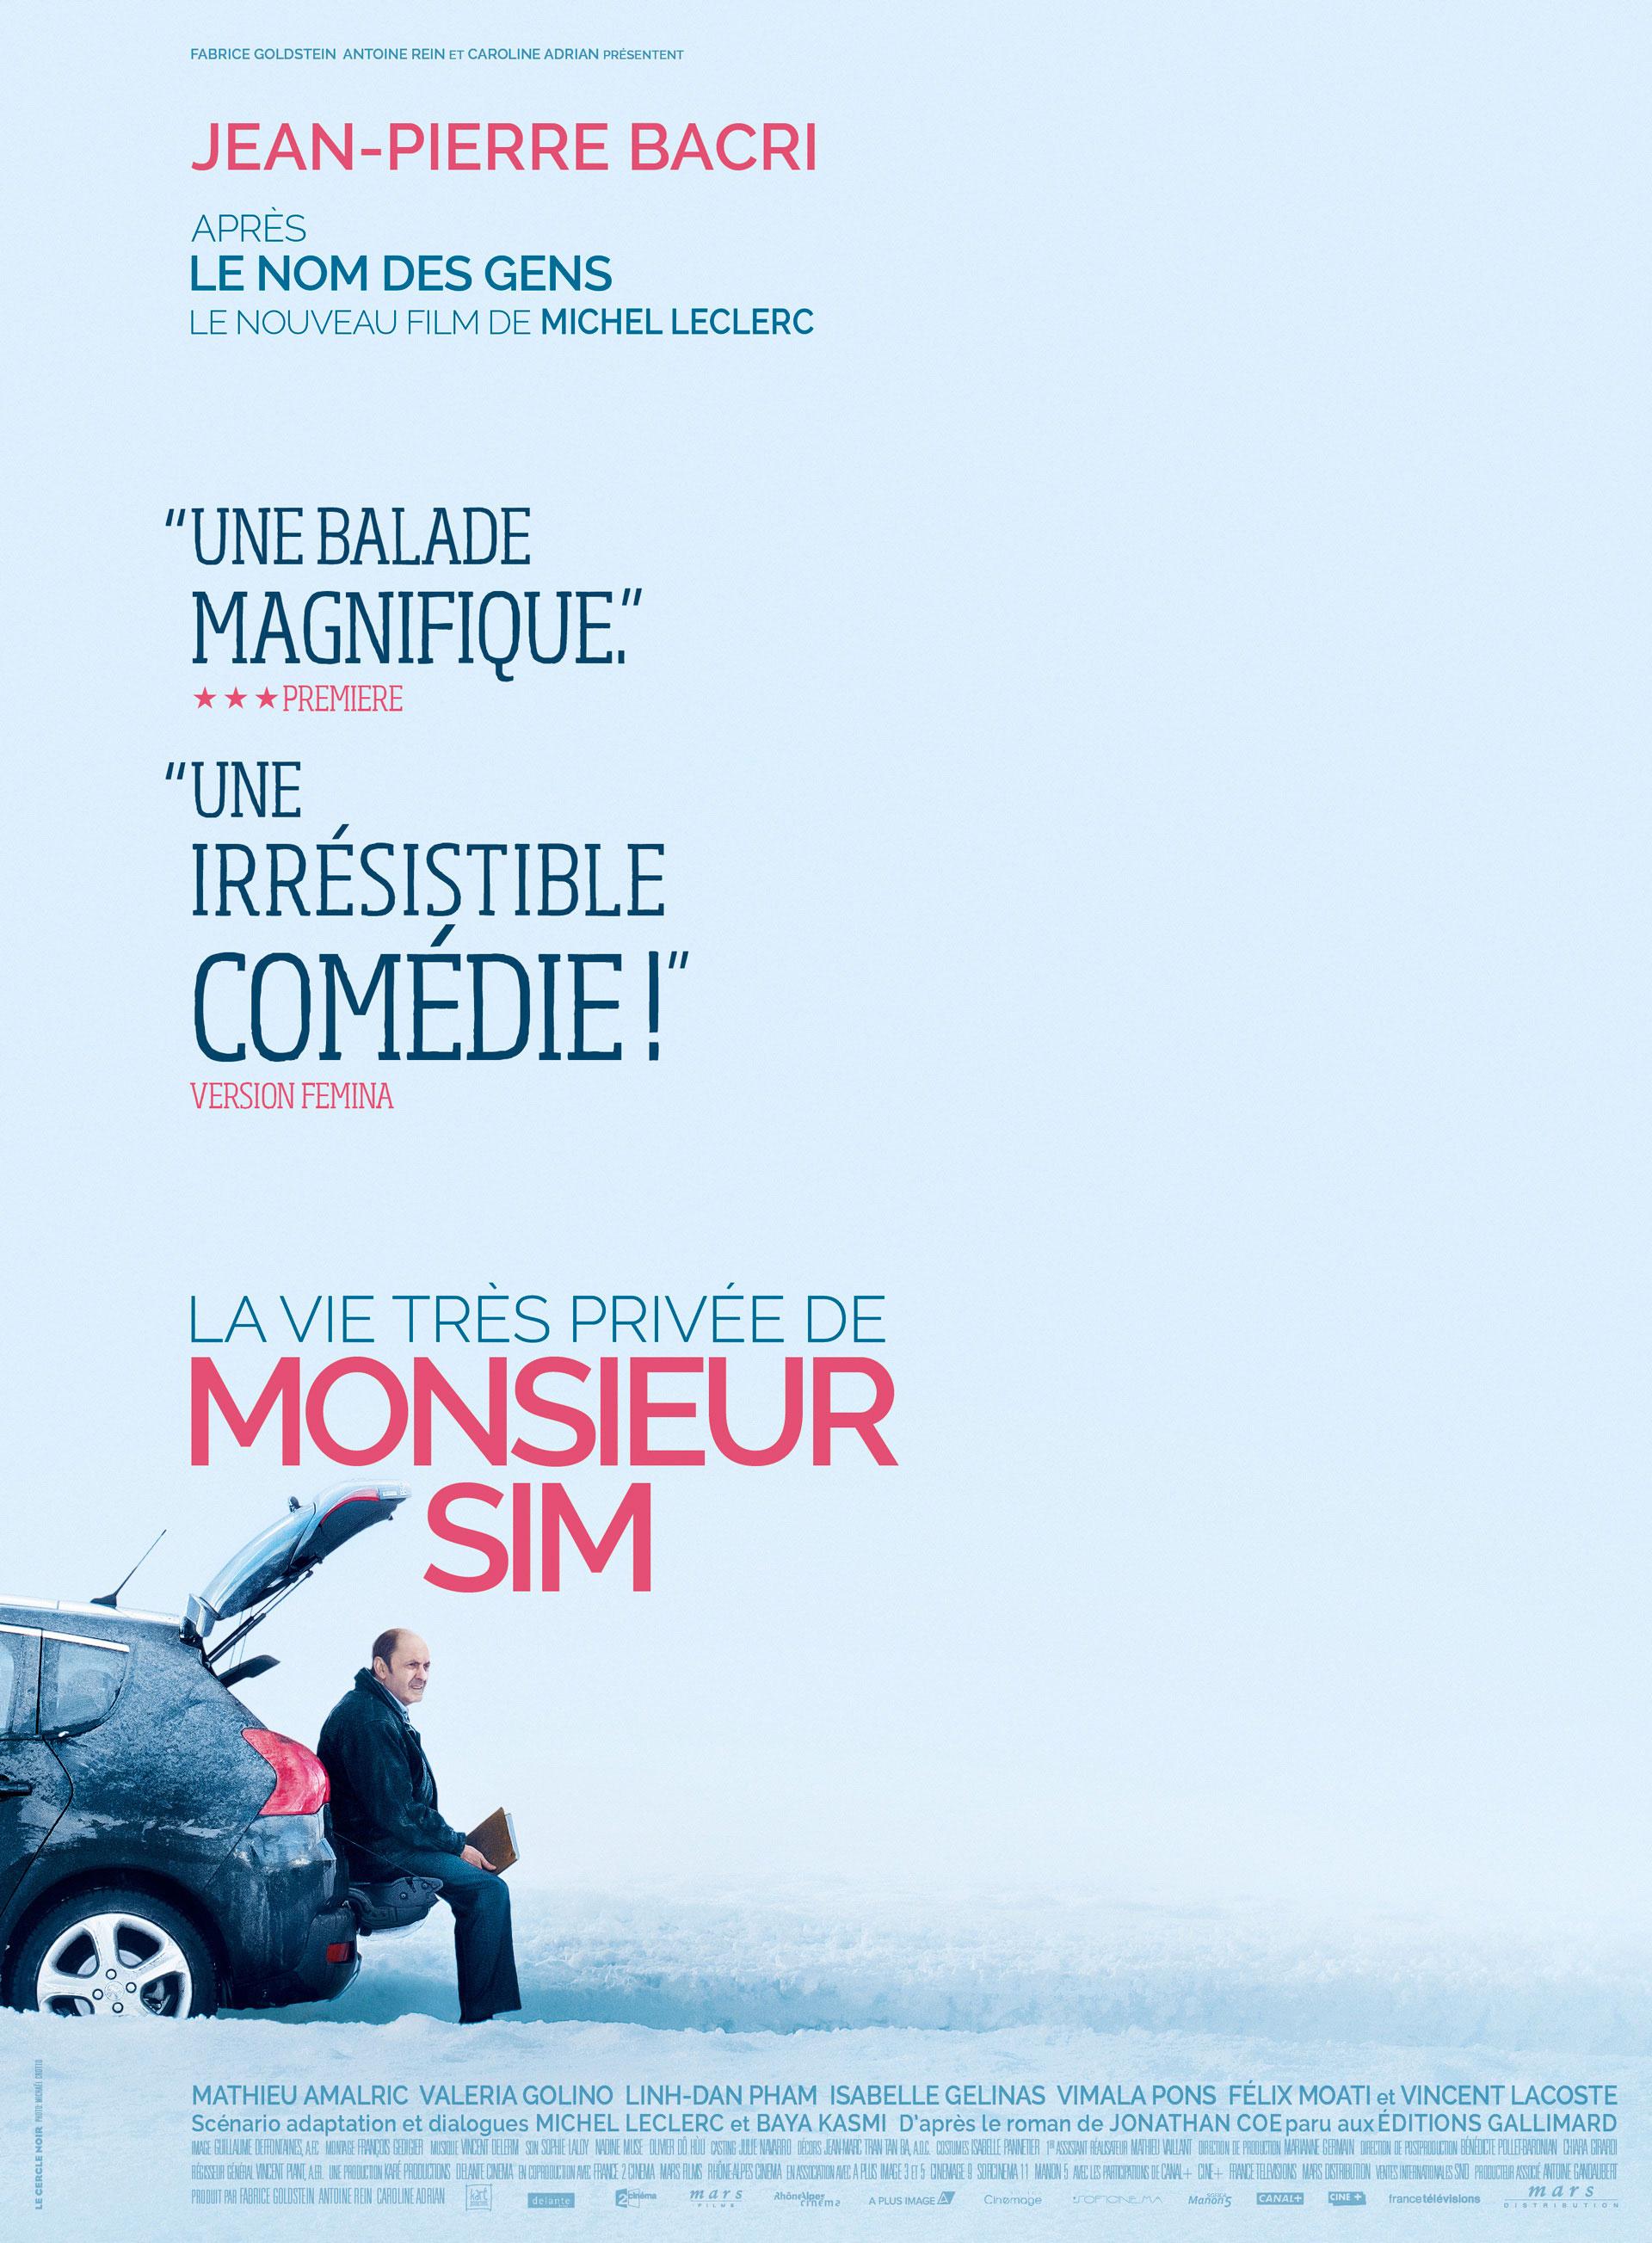 Monsieur Sim - Affiche